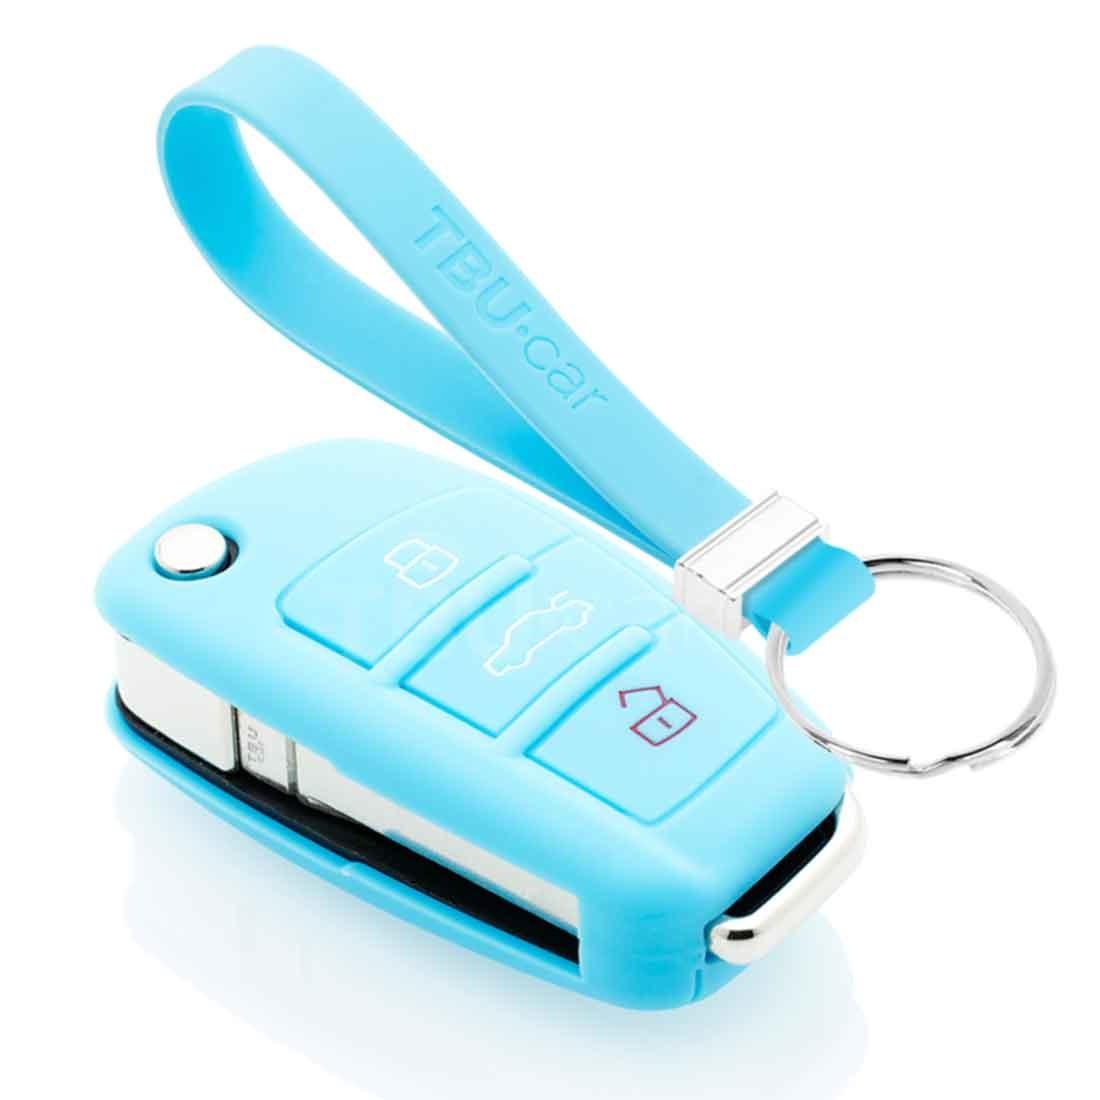 TBU car TBU car Sleutel cover compatibel met Audi - Silicone sleutelhoesje - beschermhoesje autosleutel - Lichtblauw